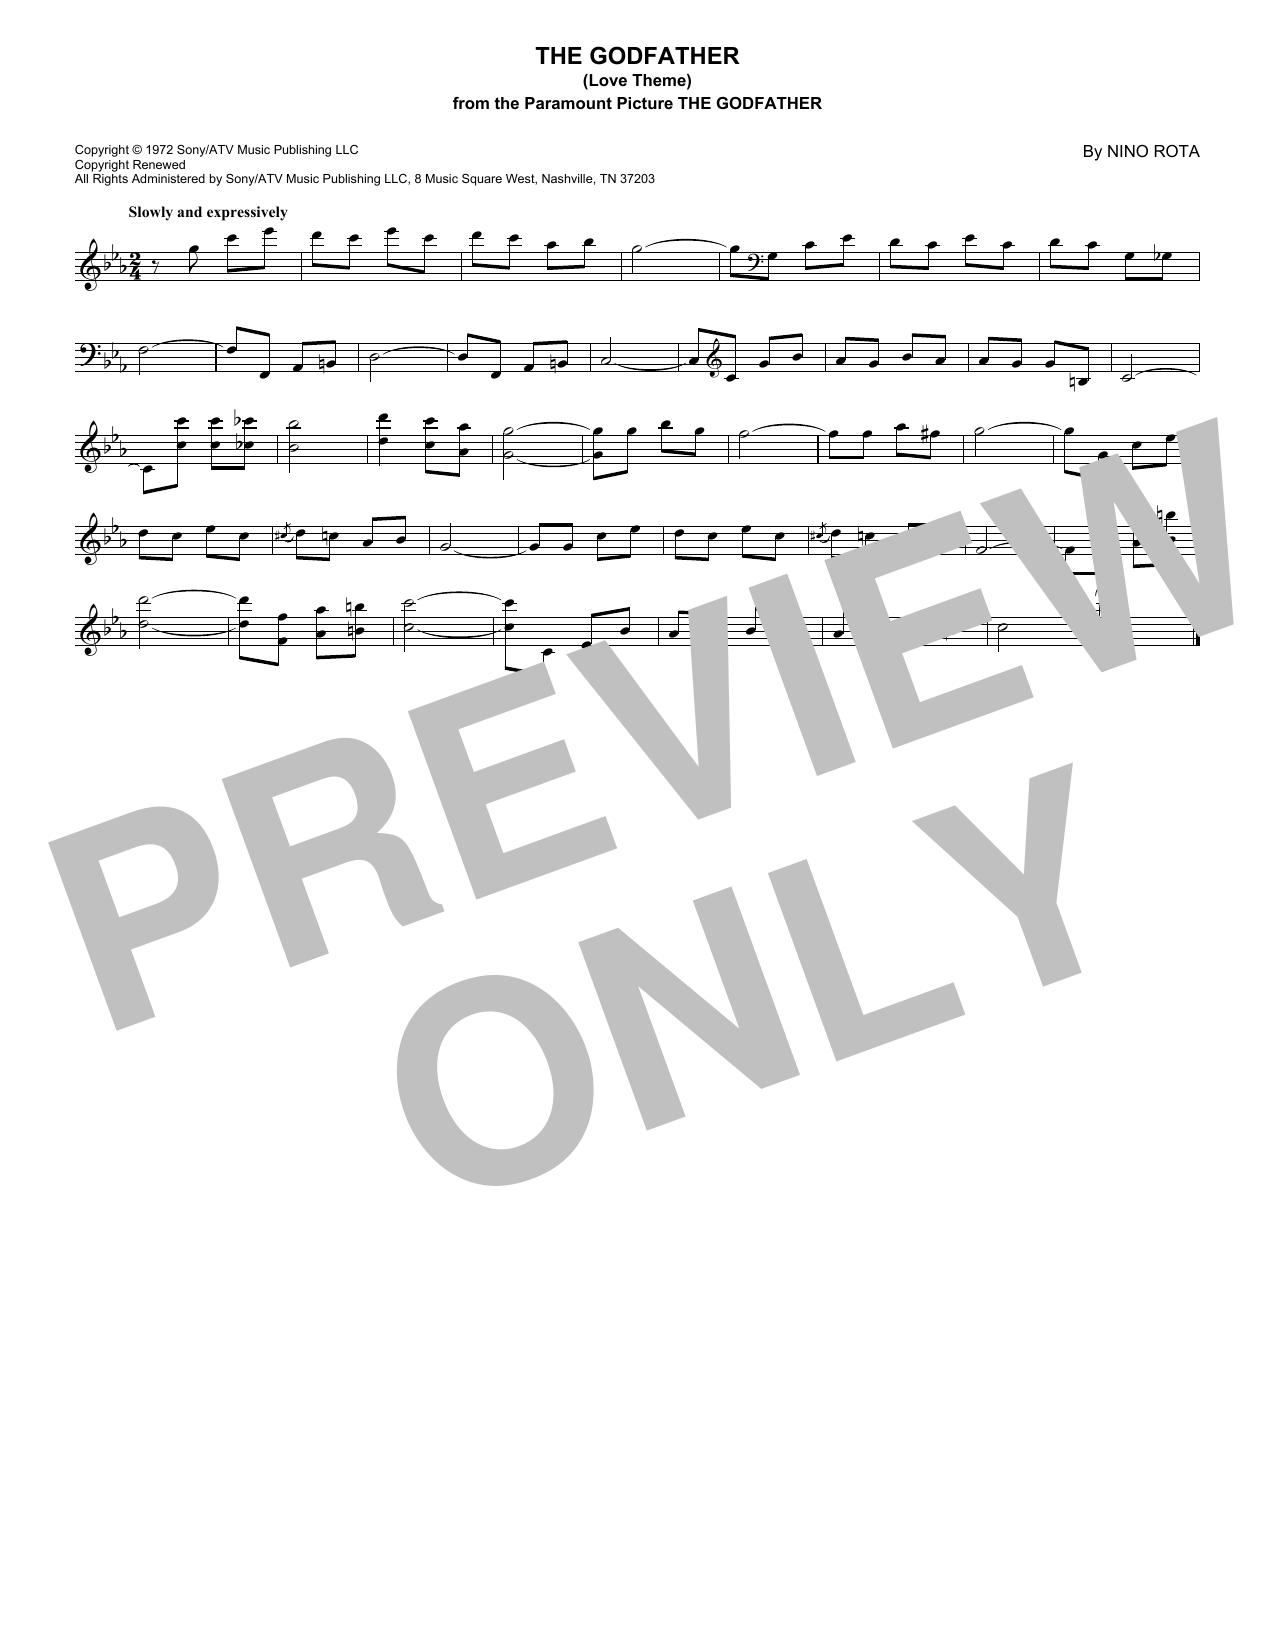 The Godfather Love Theme Sheet Music Nino Rota Melody Line